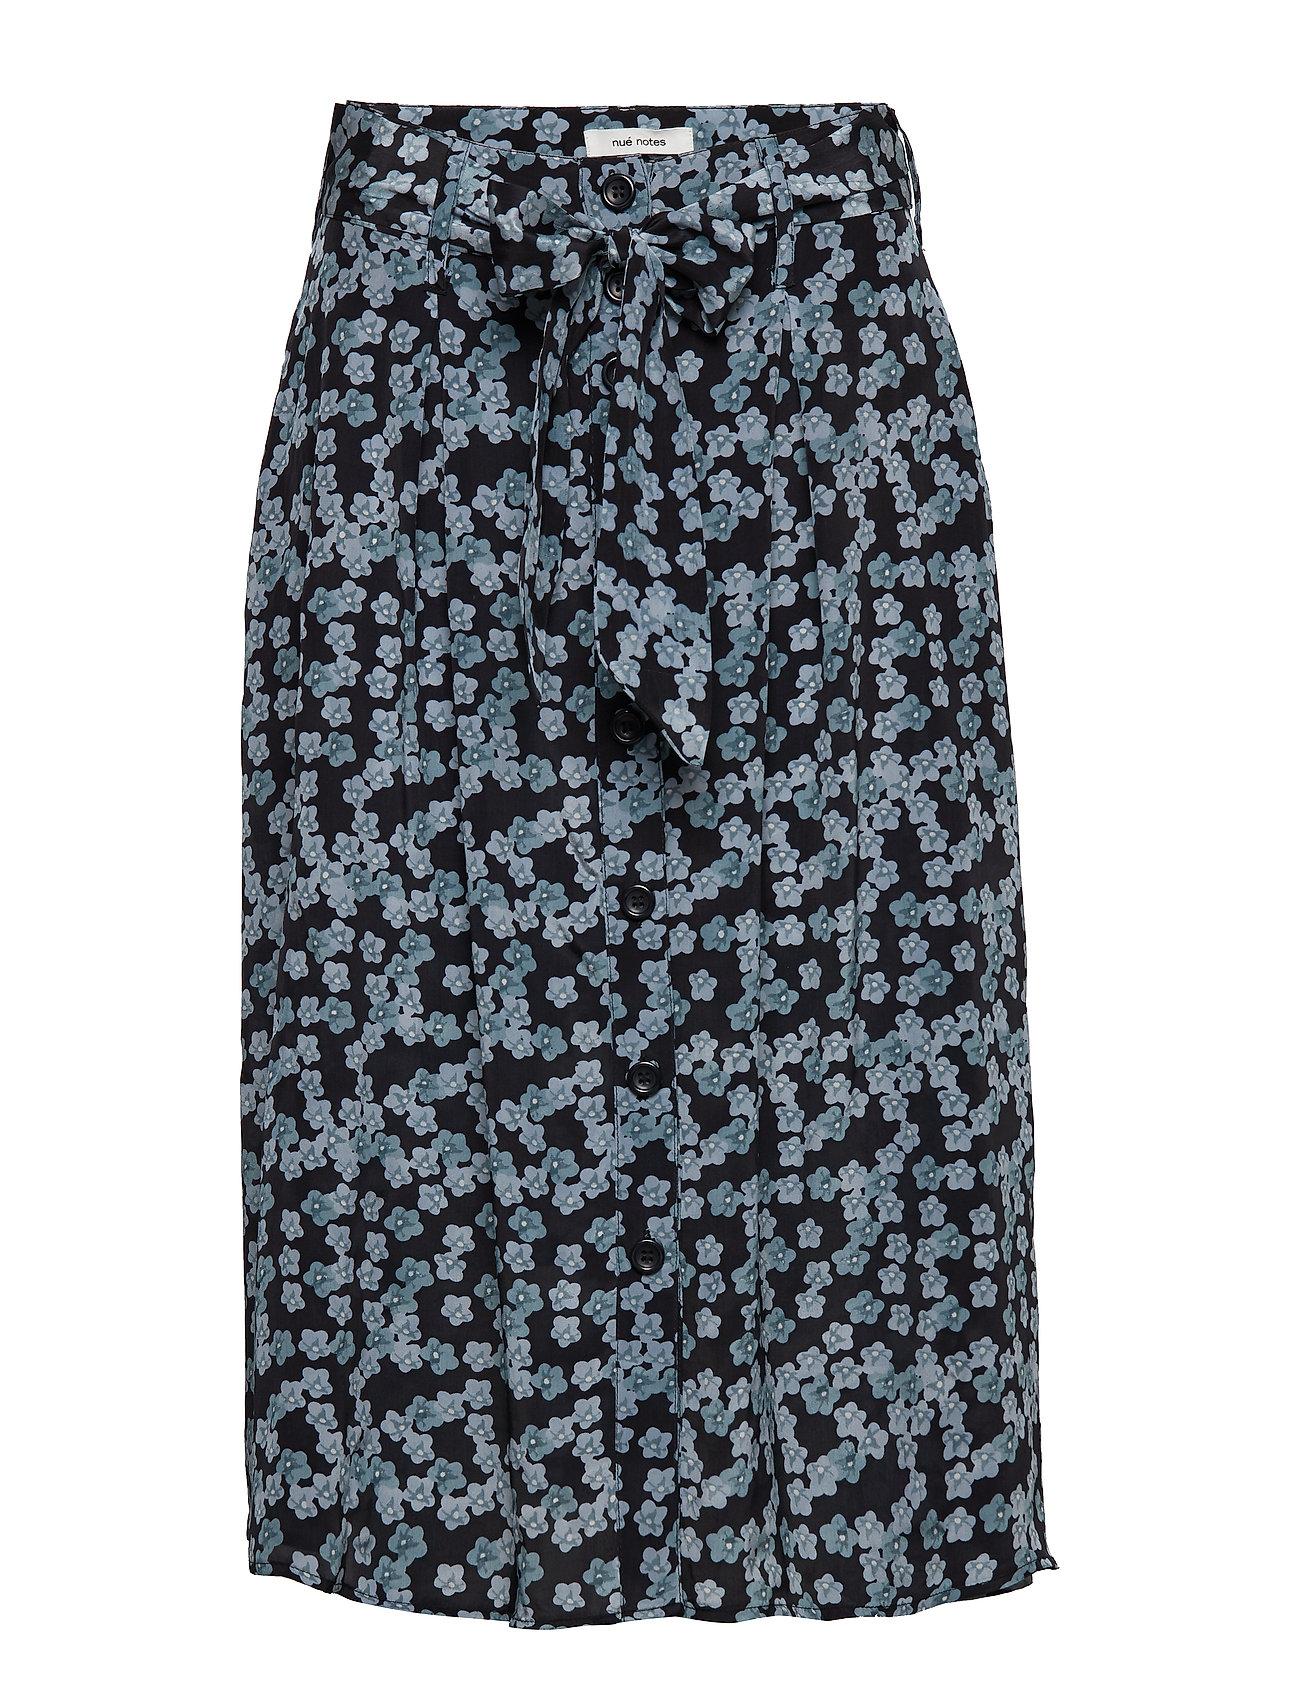 Nué notes Zurich Skirt Kjolar